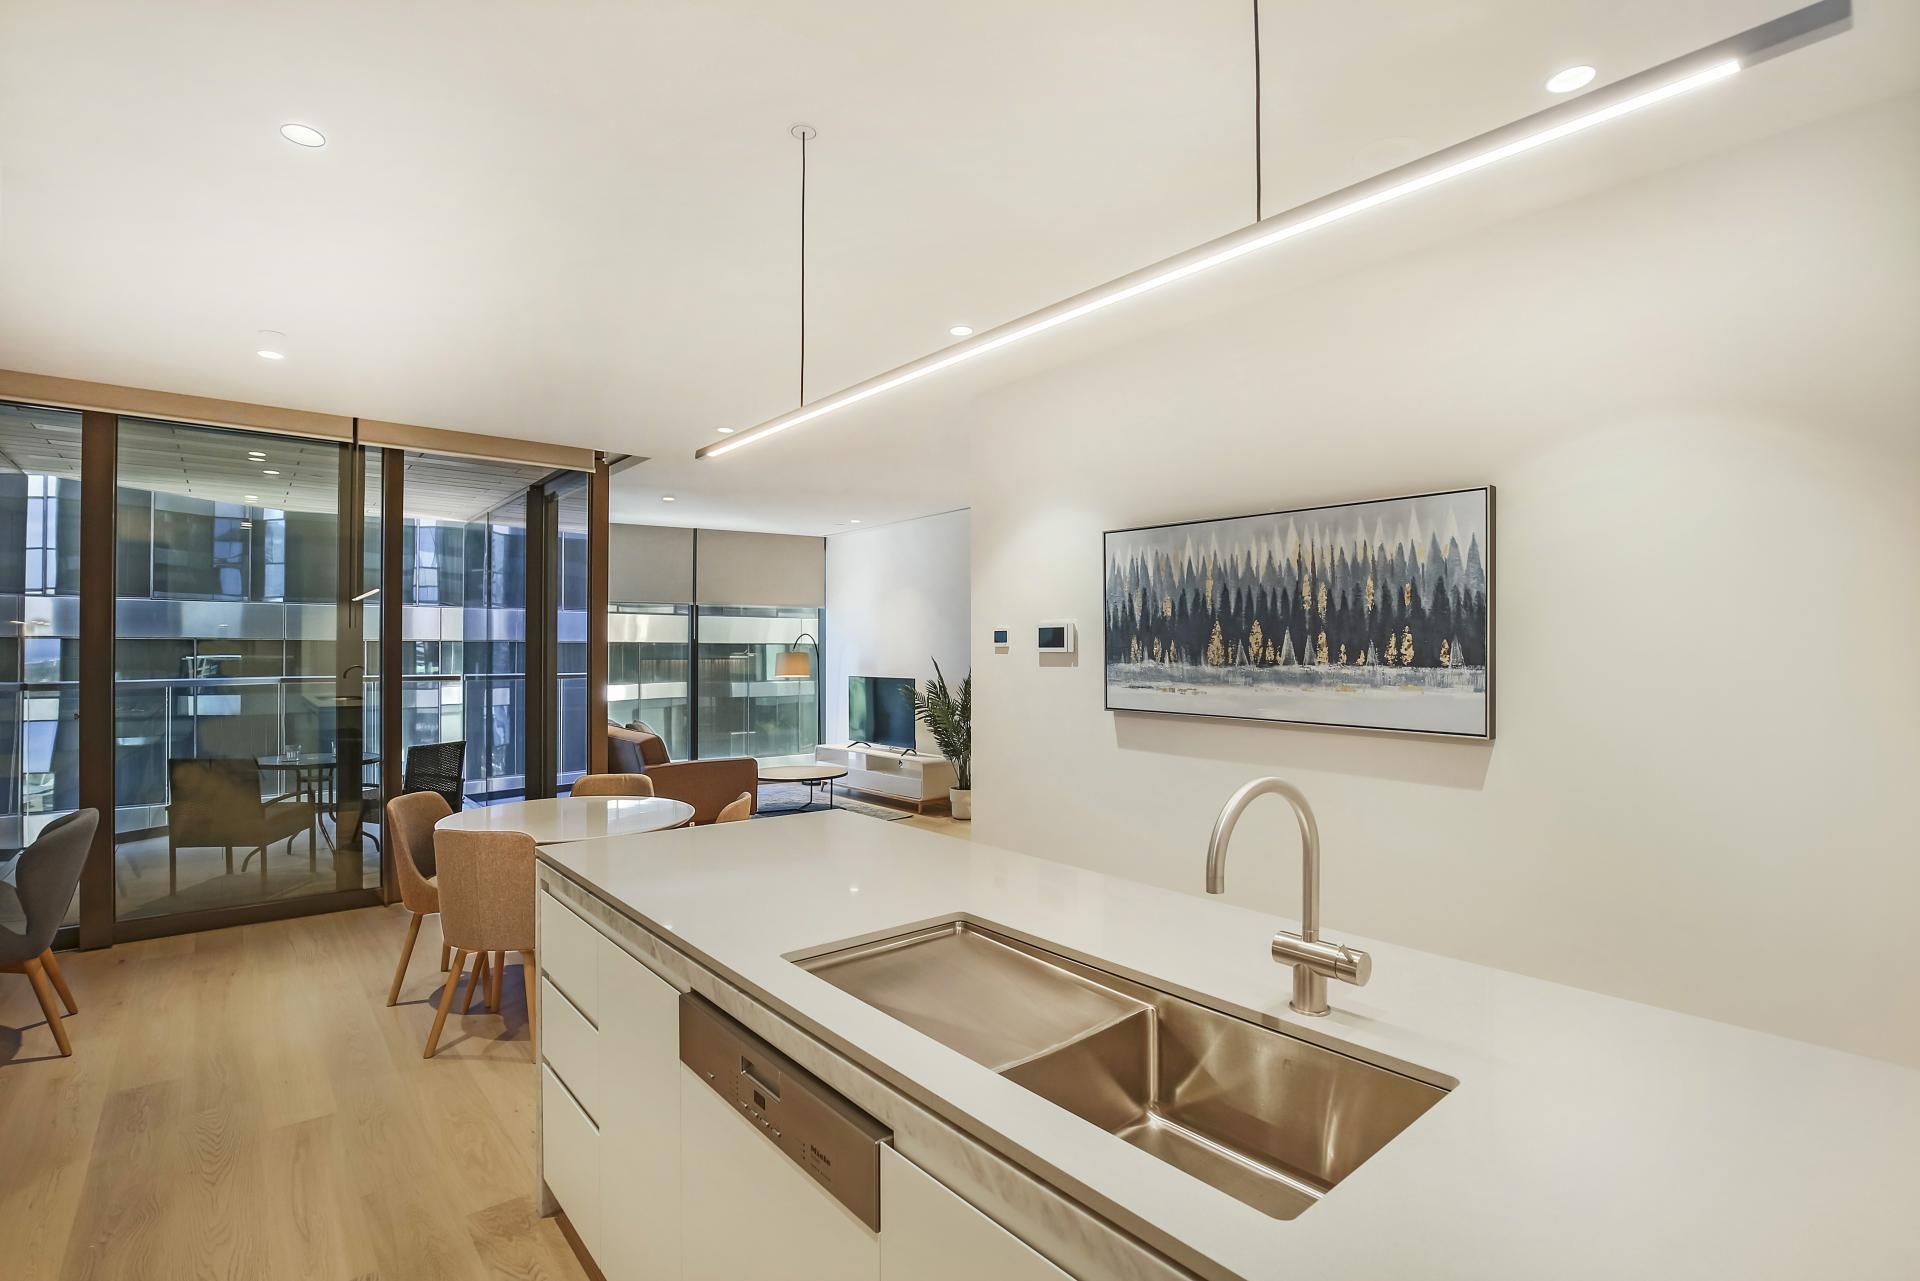 Kitchen at Astra Melbourne CBD Liberty Tower, Centre, Melbourne - Citybase Apartments